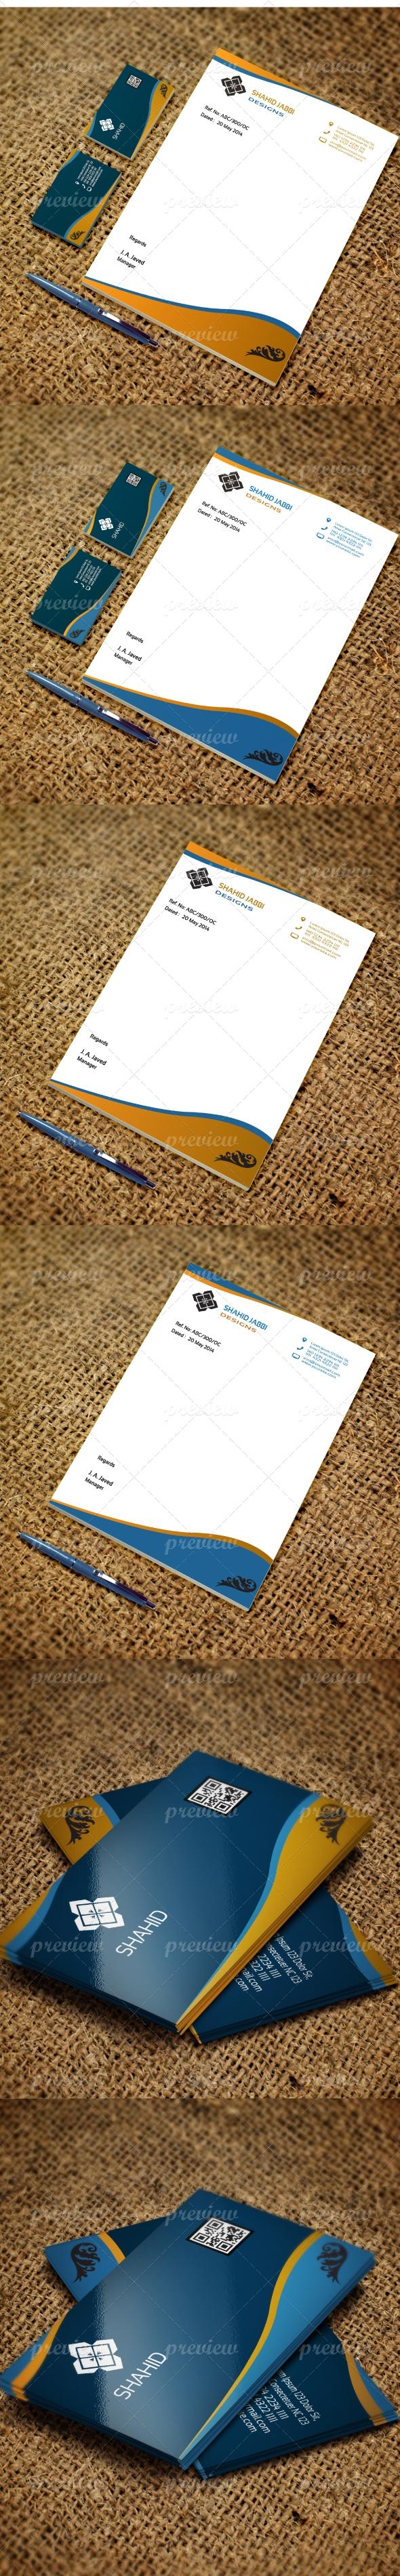 Jabbi Business Card & Letterhead